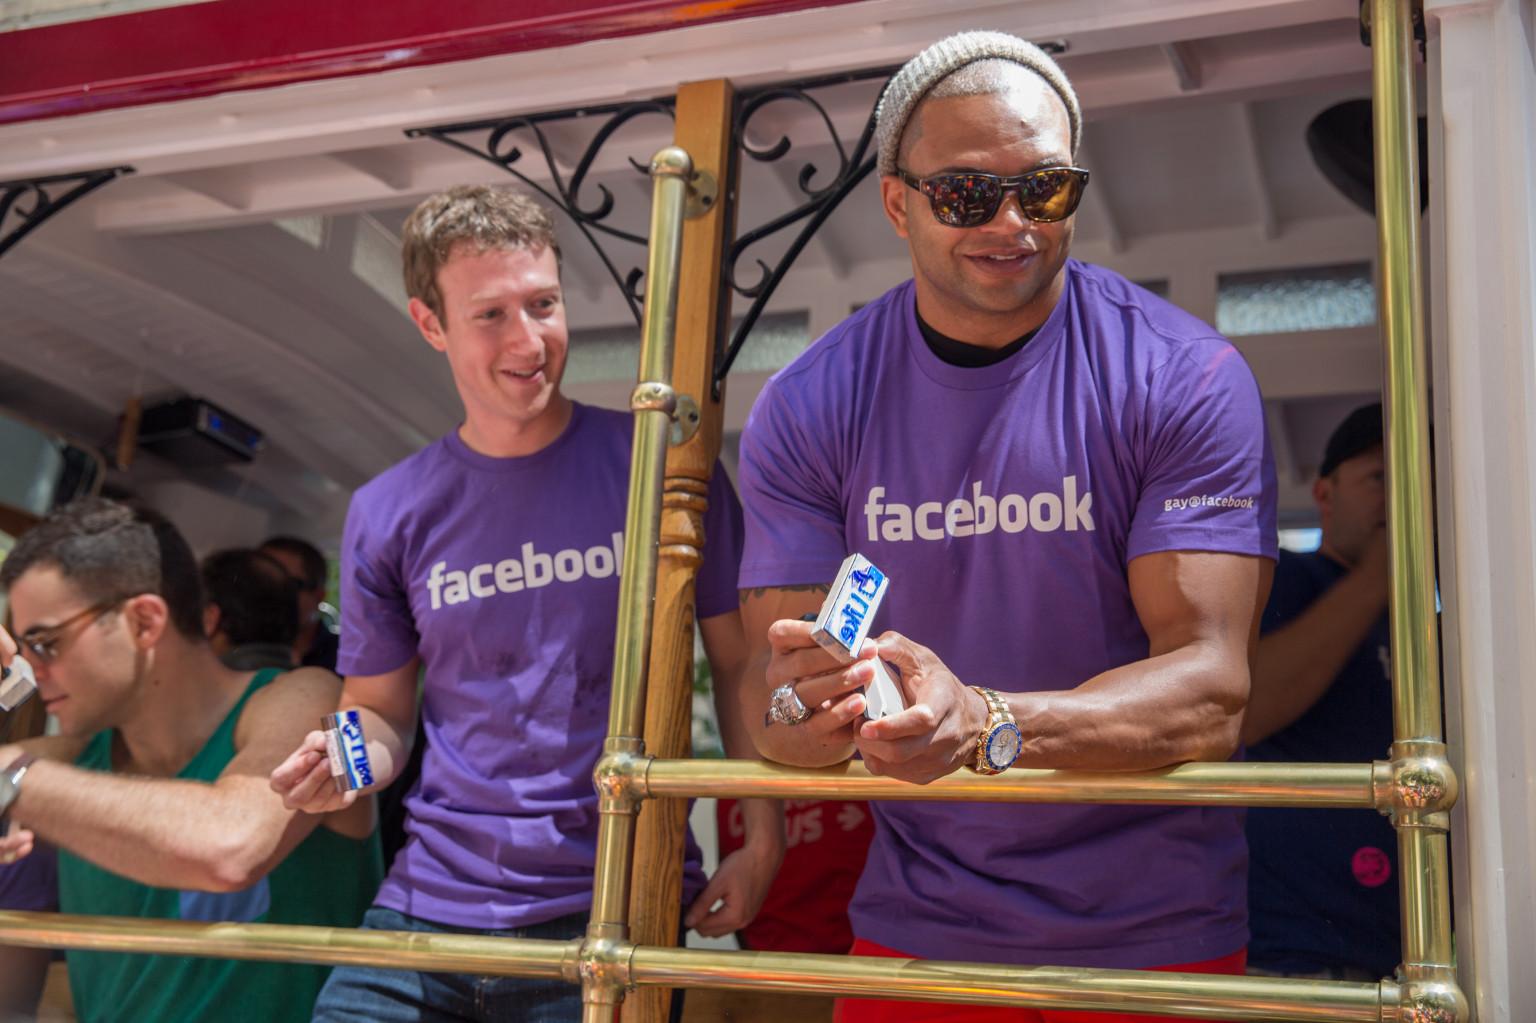 Is Mark Zuckerberg Gay 119